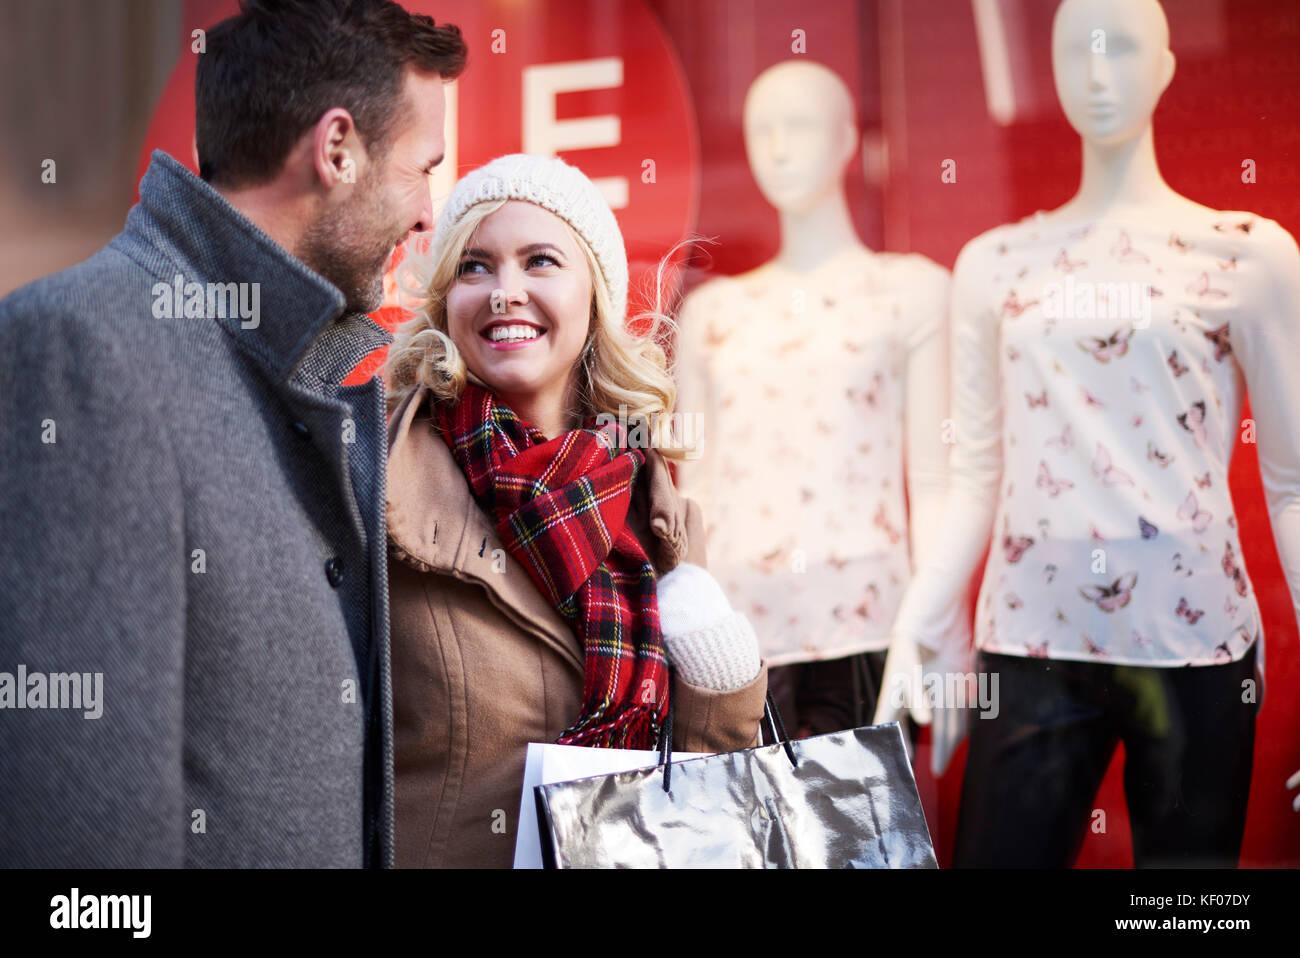 Couple spending money on new seasonal clothes - Stock Image